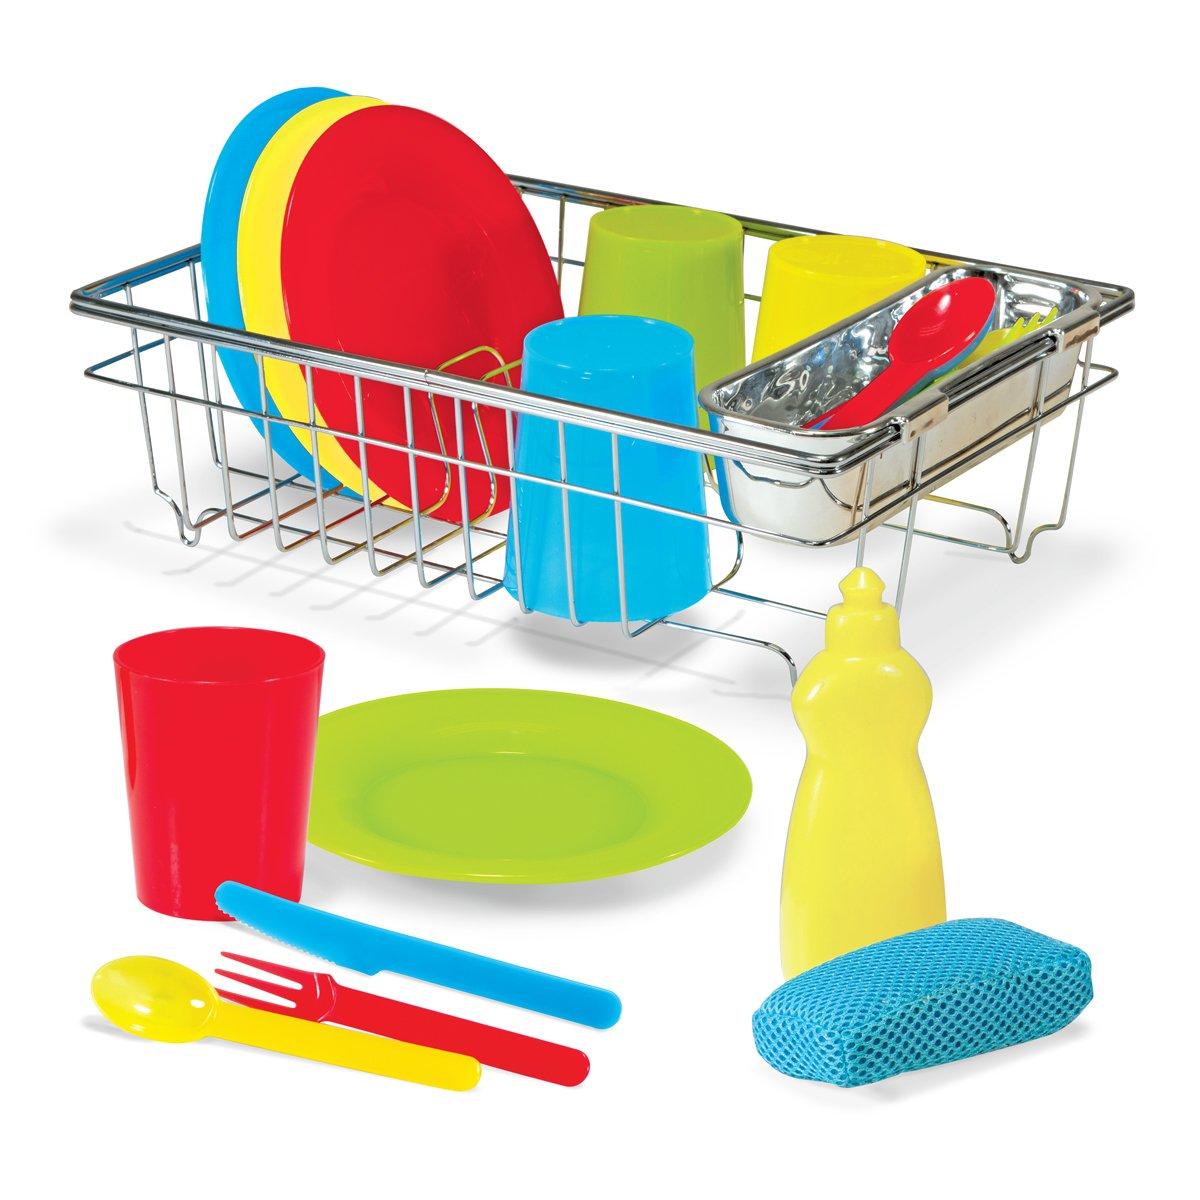 Play kitchen clip art - Amazon Com Melissa Doug Let S Play House Wash And Dry Dish Set 24 Pcs Melissa Doug Toys Games